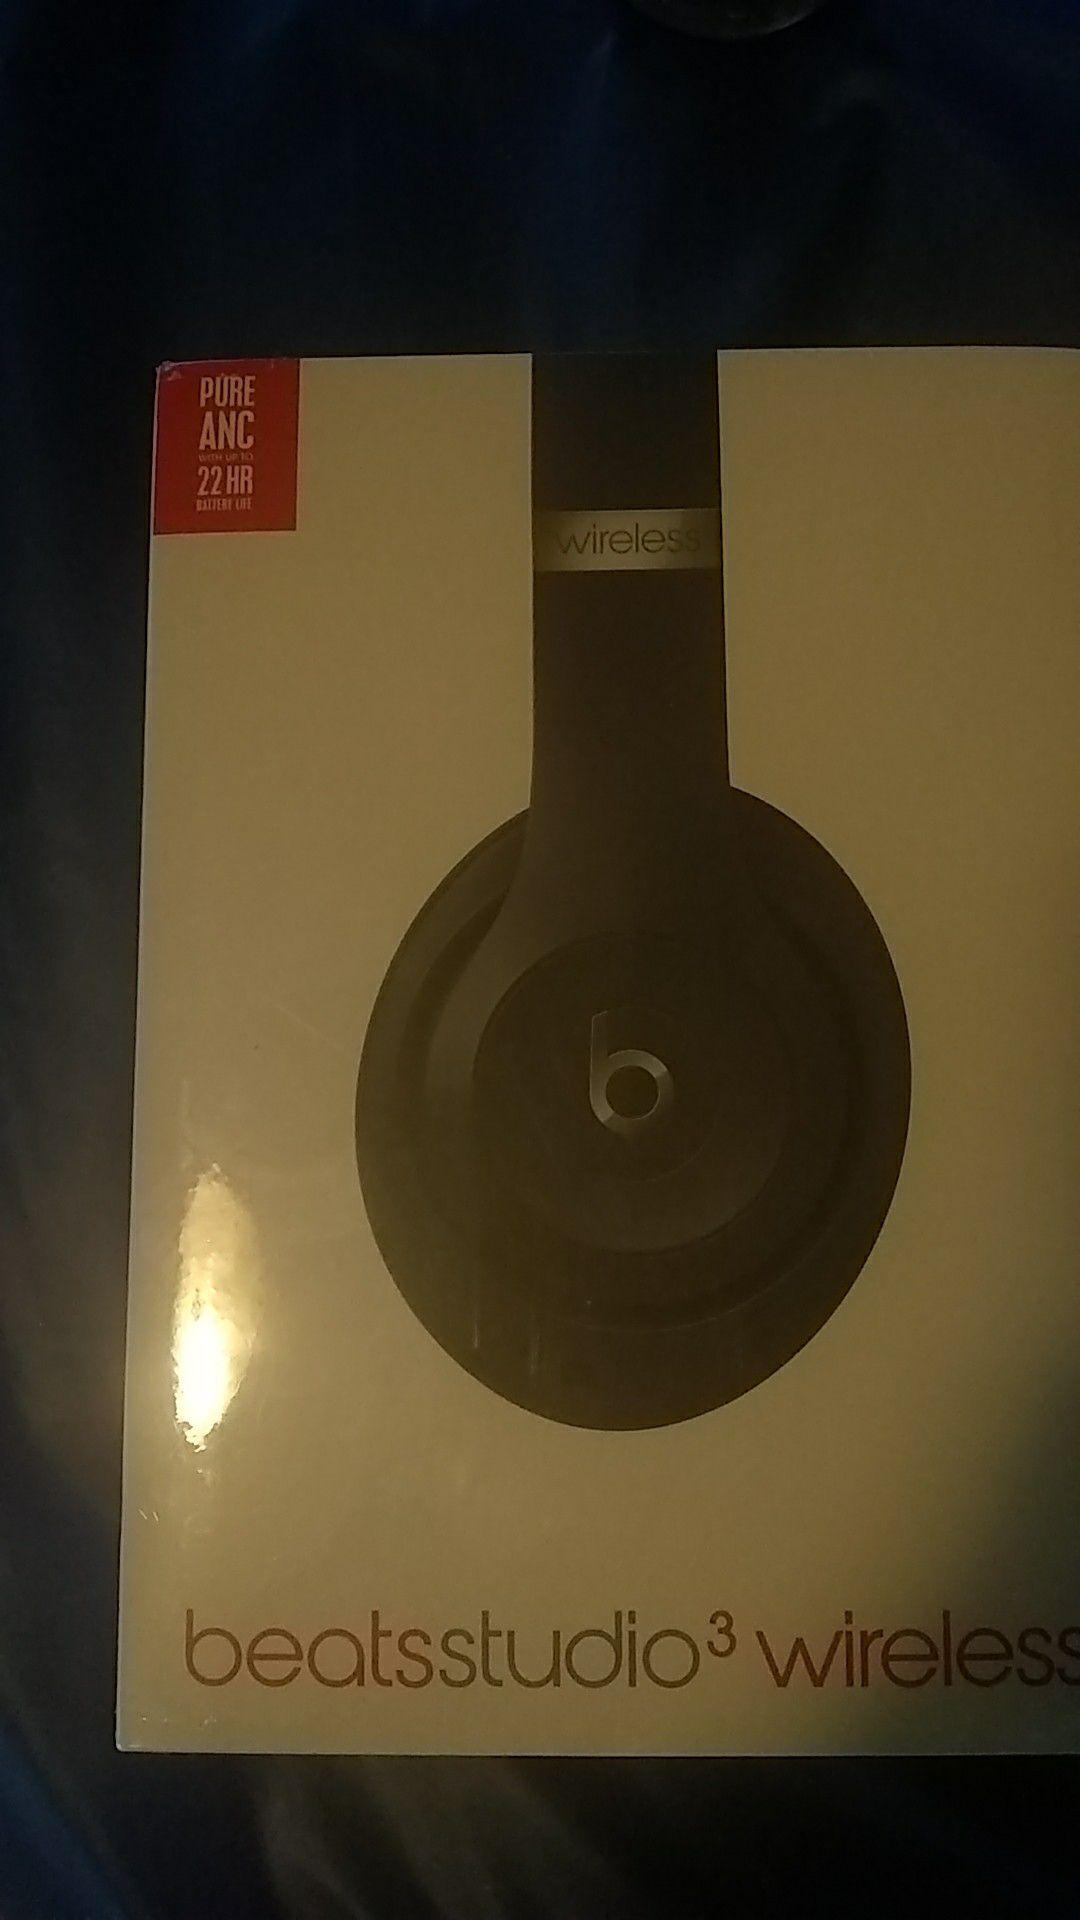 BeatsStudio3 wireless